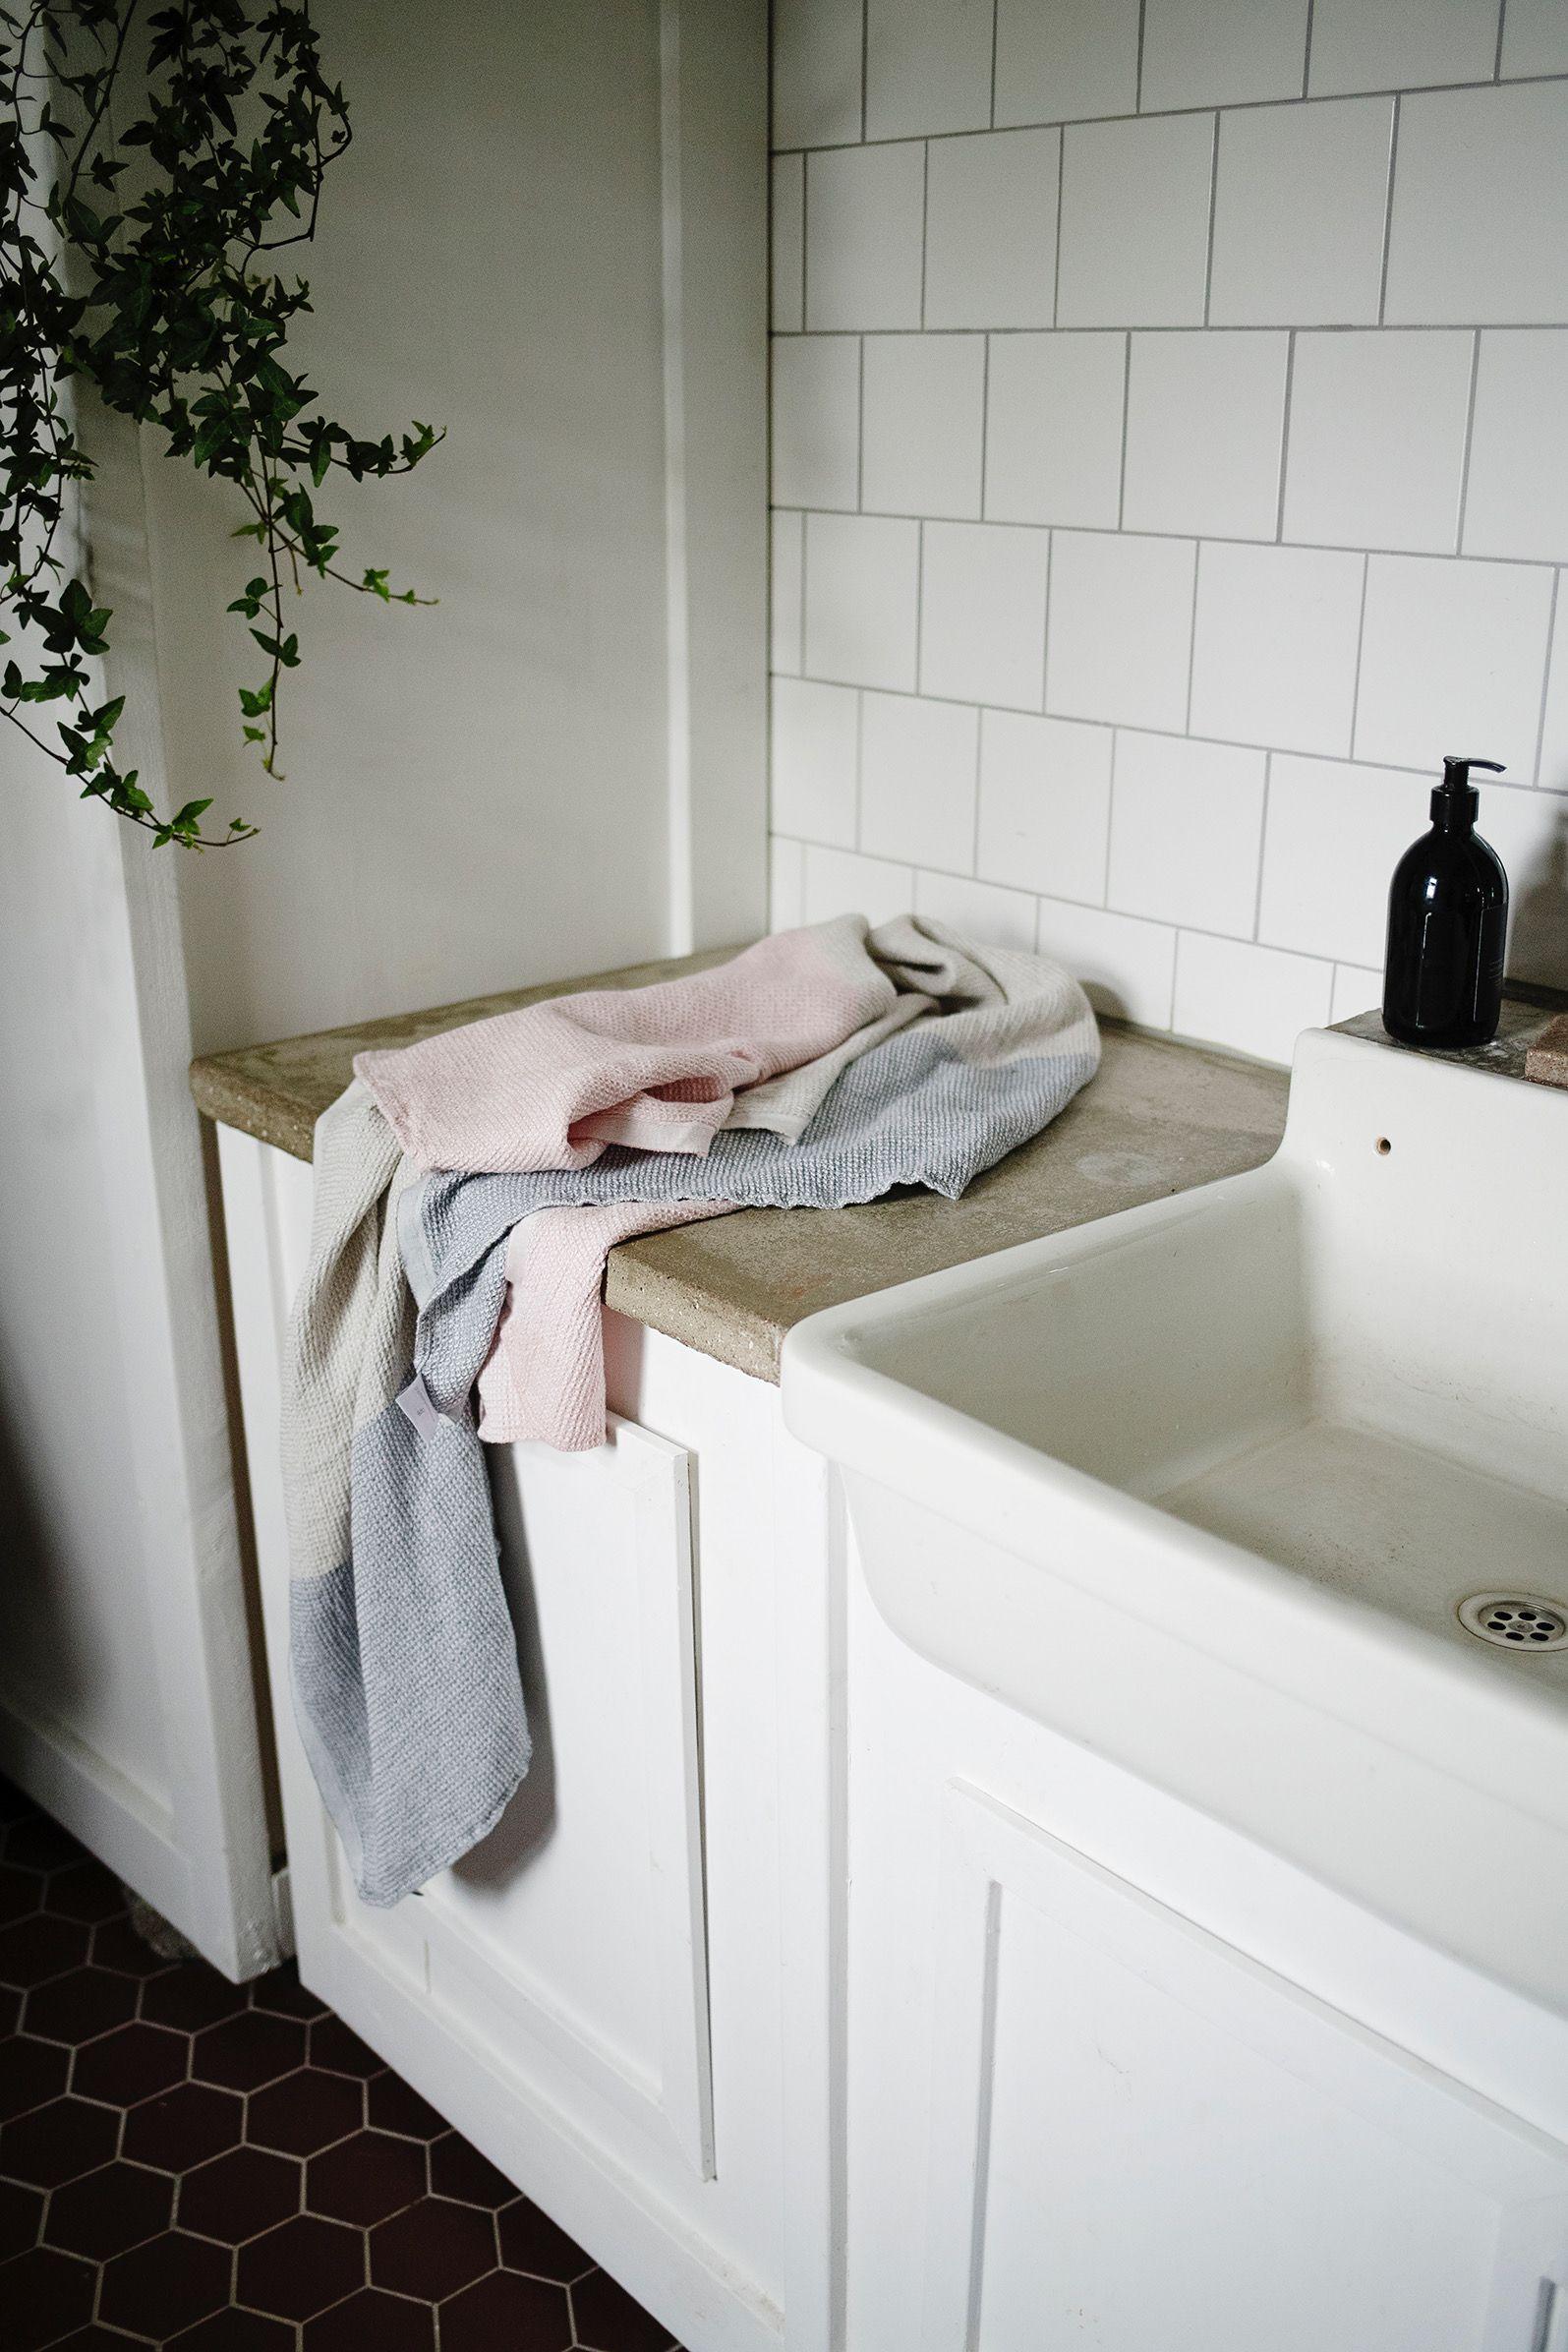 Finnish Bathroom Design New Bathroom Trending Bing soccer Health Risks  Study Finland